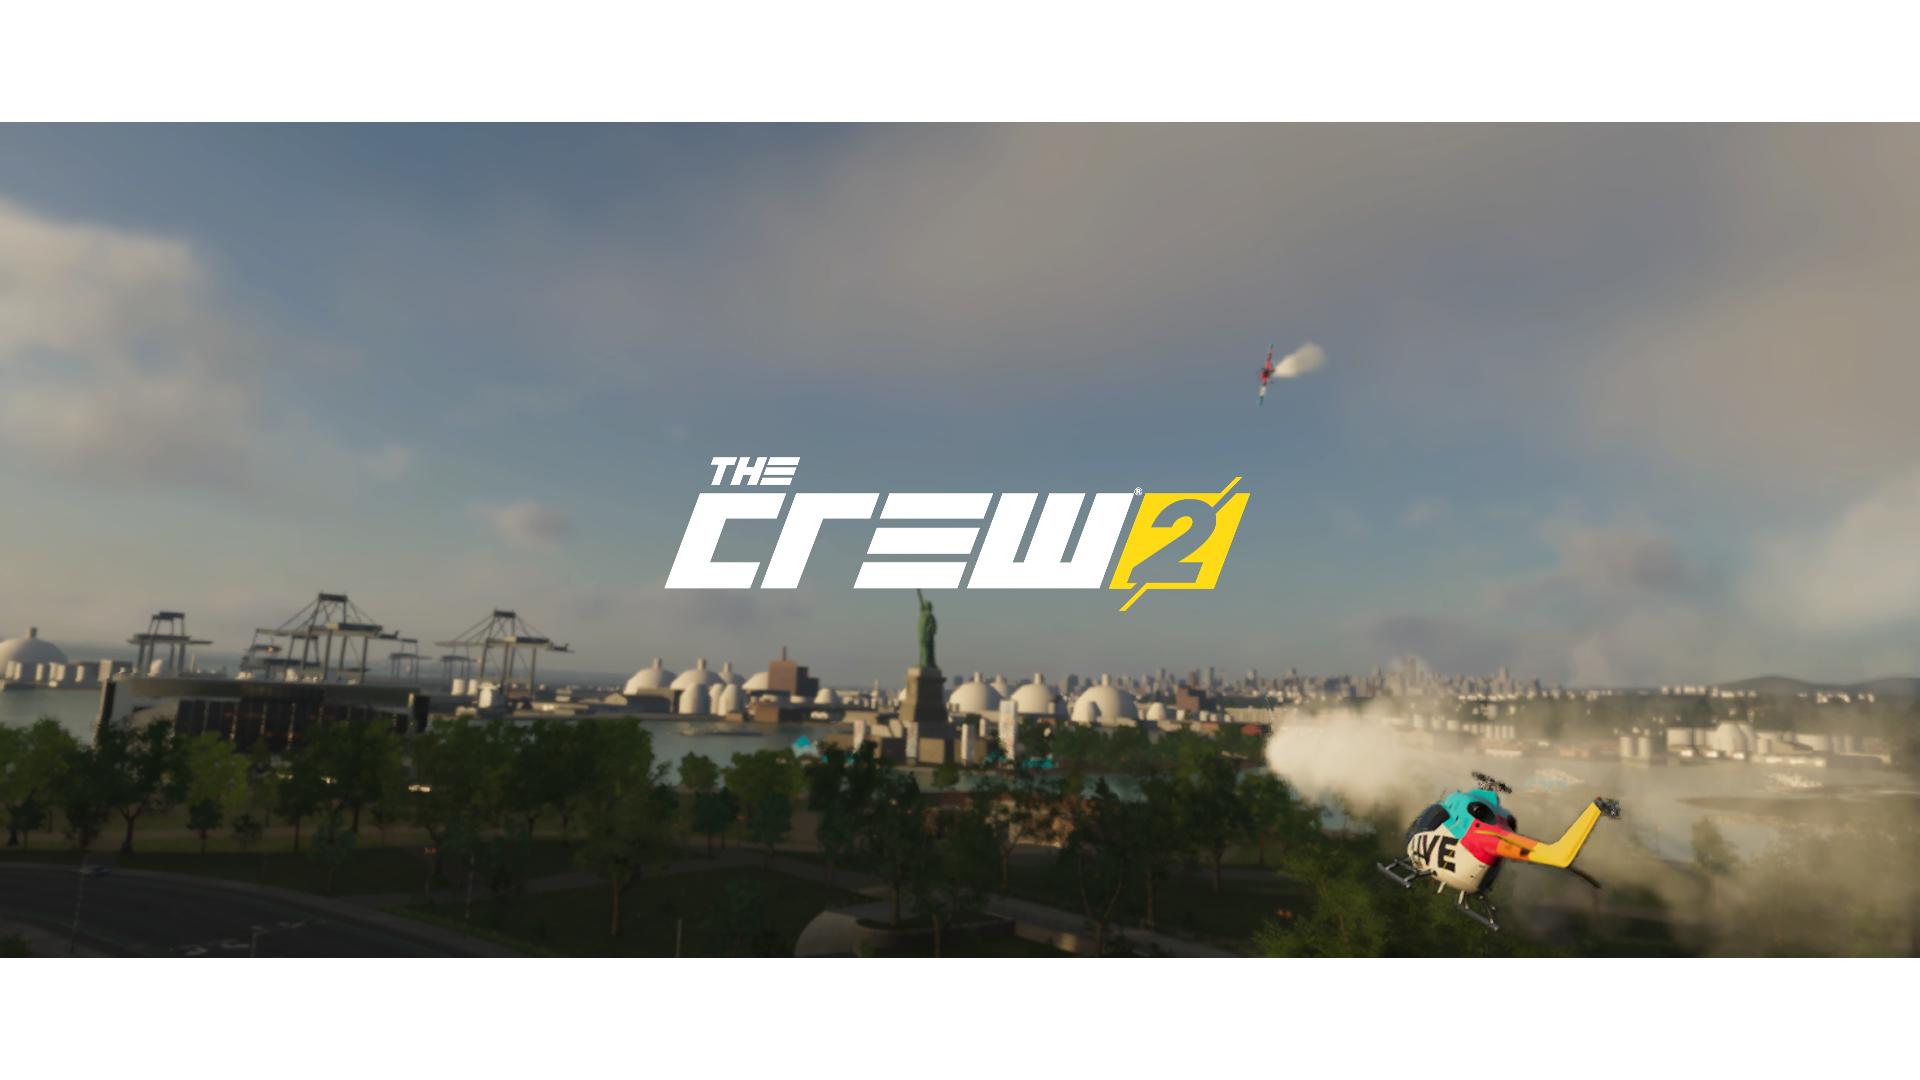 The Crew 2 Title